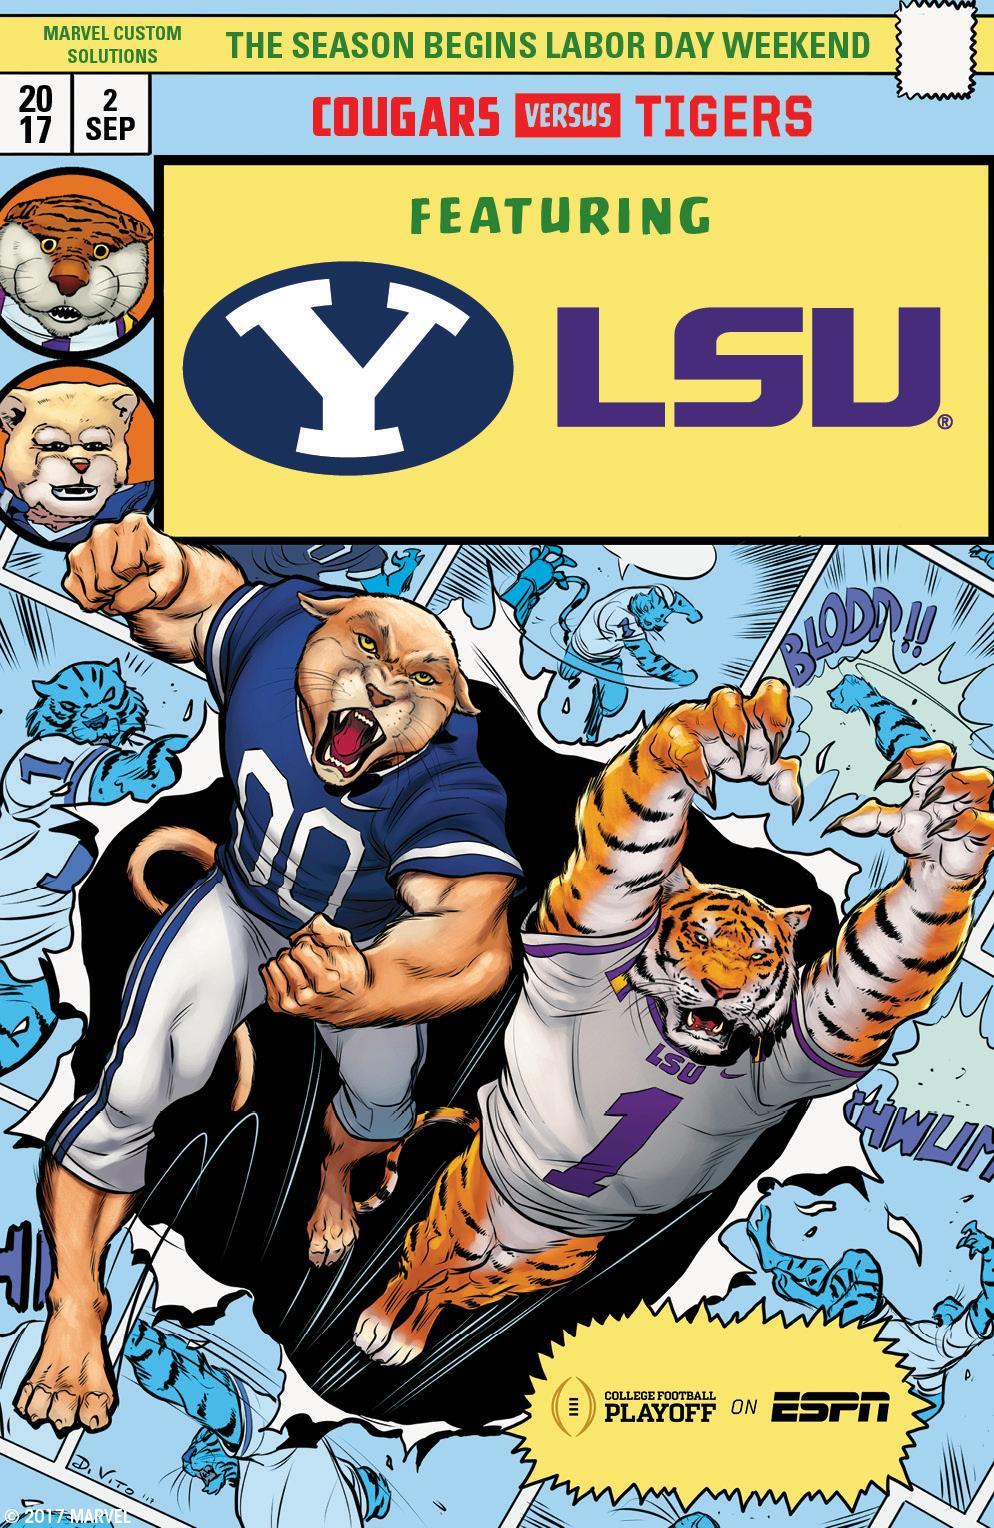 Brigham Young vs LSU